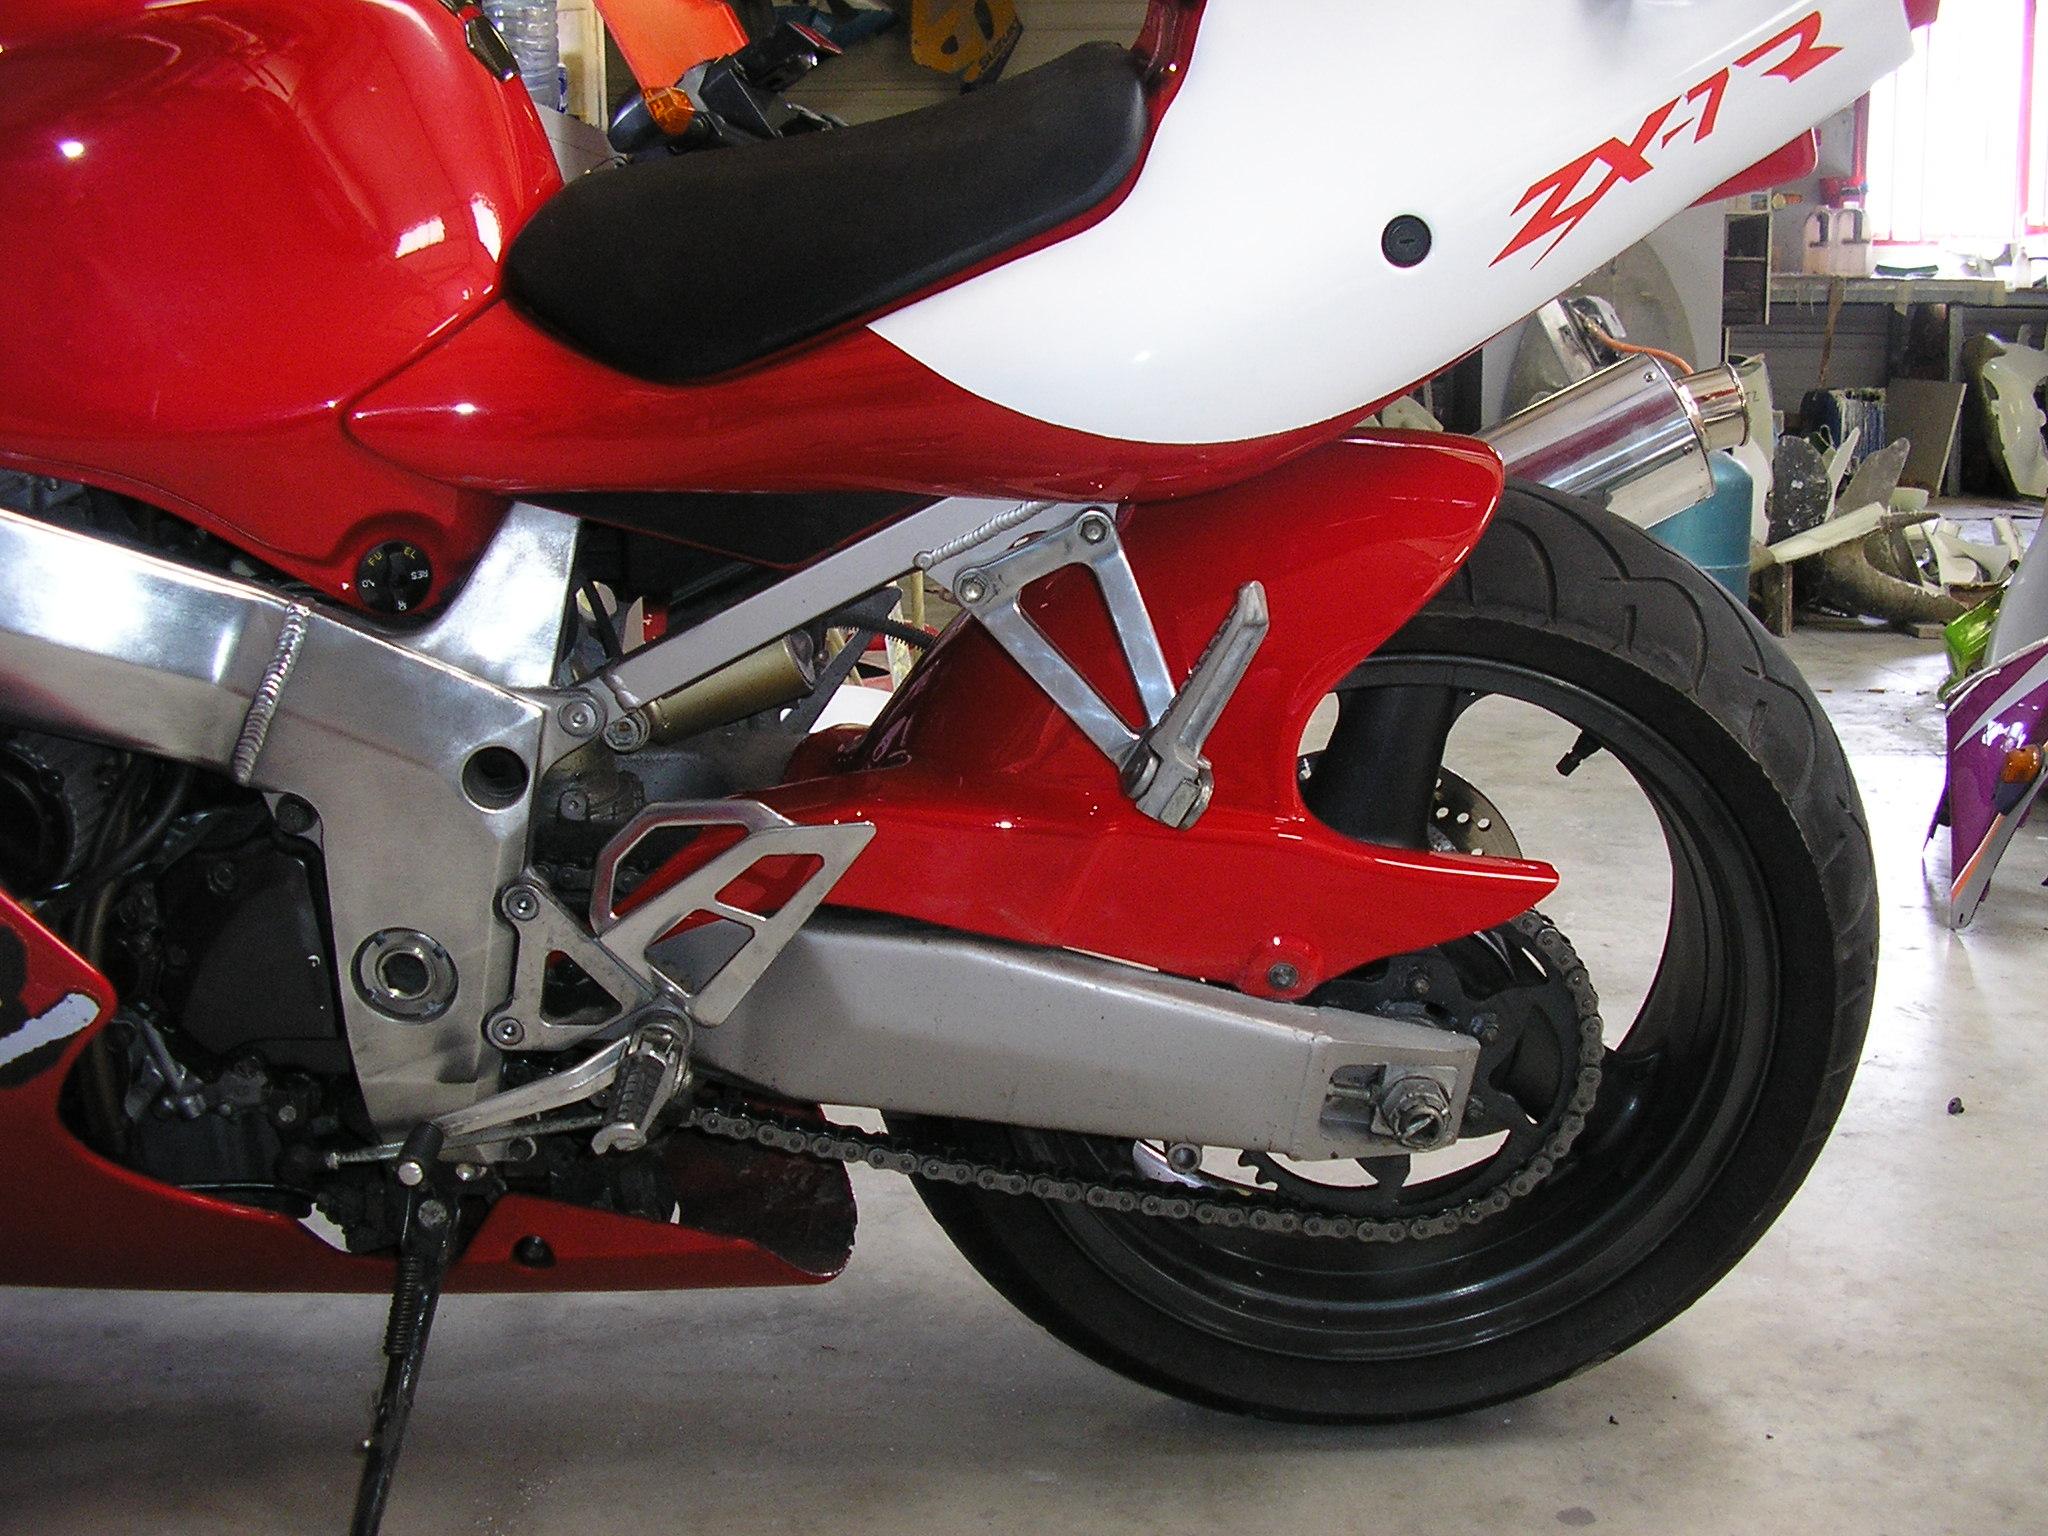 Composites moto artisan commerçant carrosserie moto achat vente motos